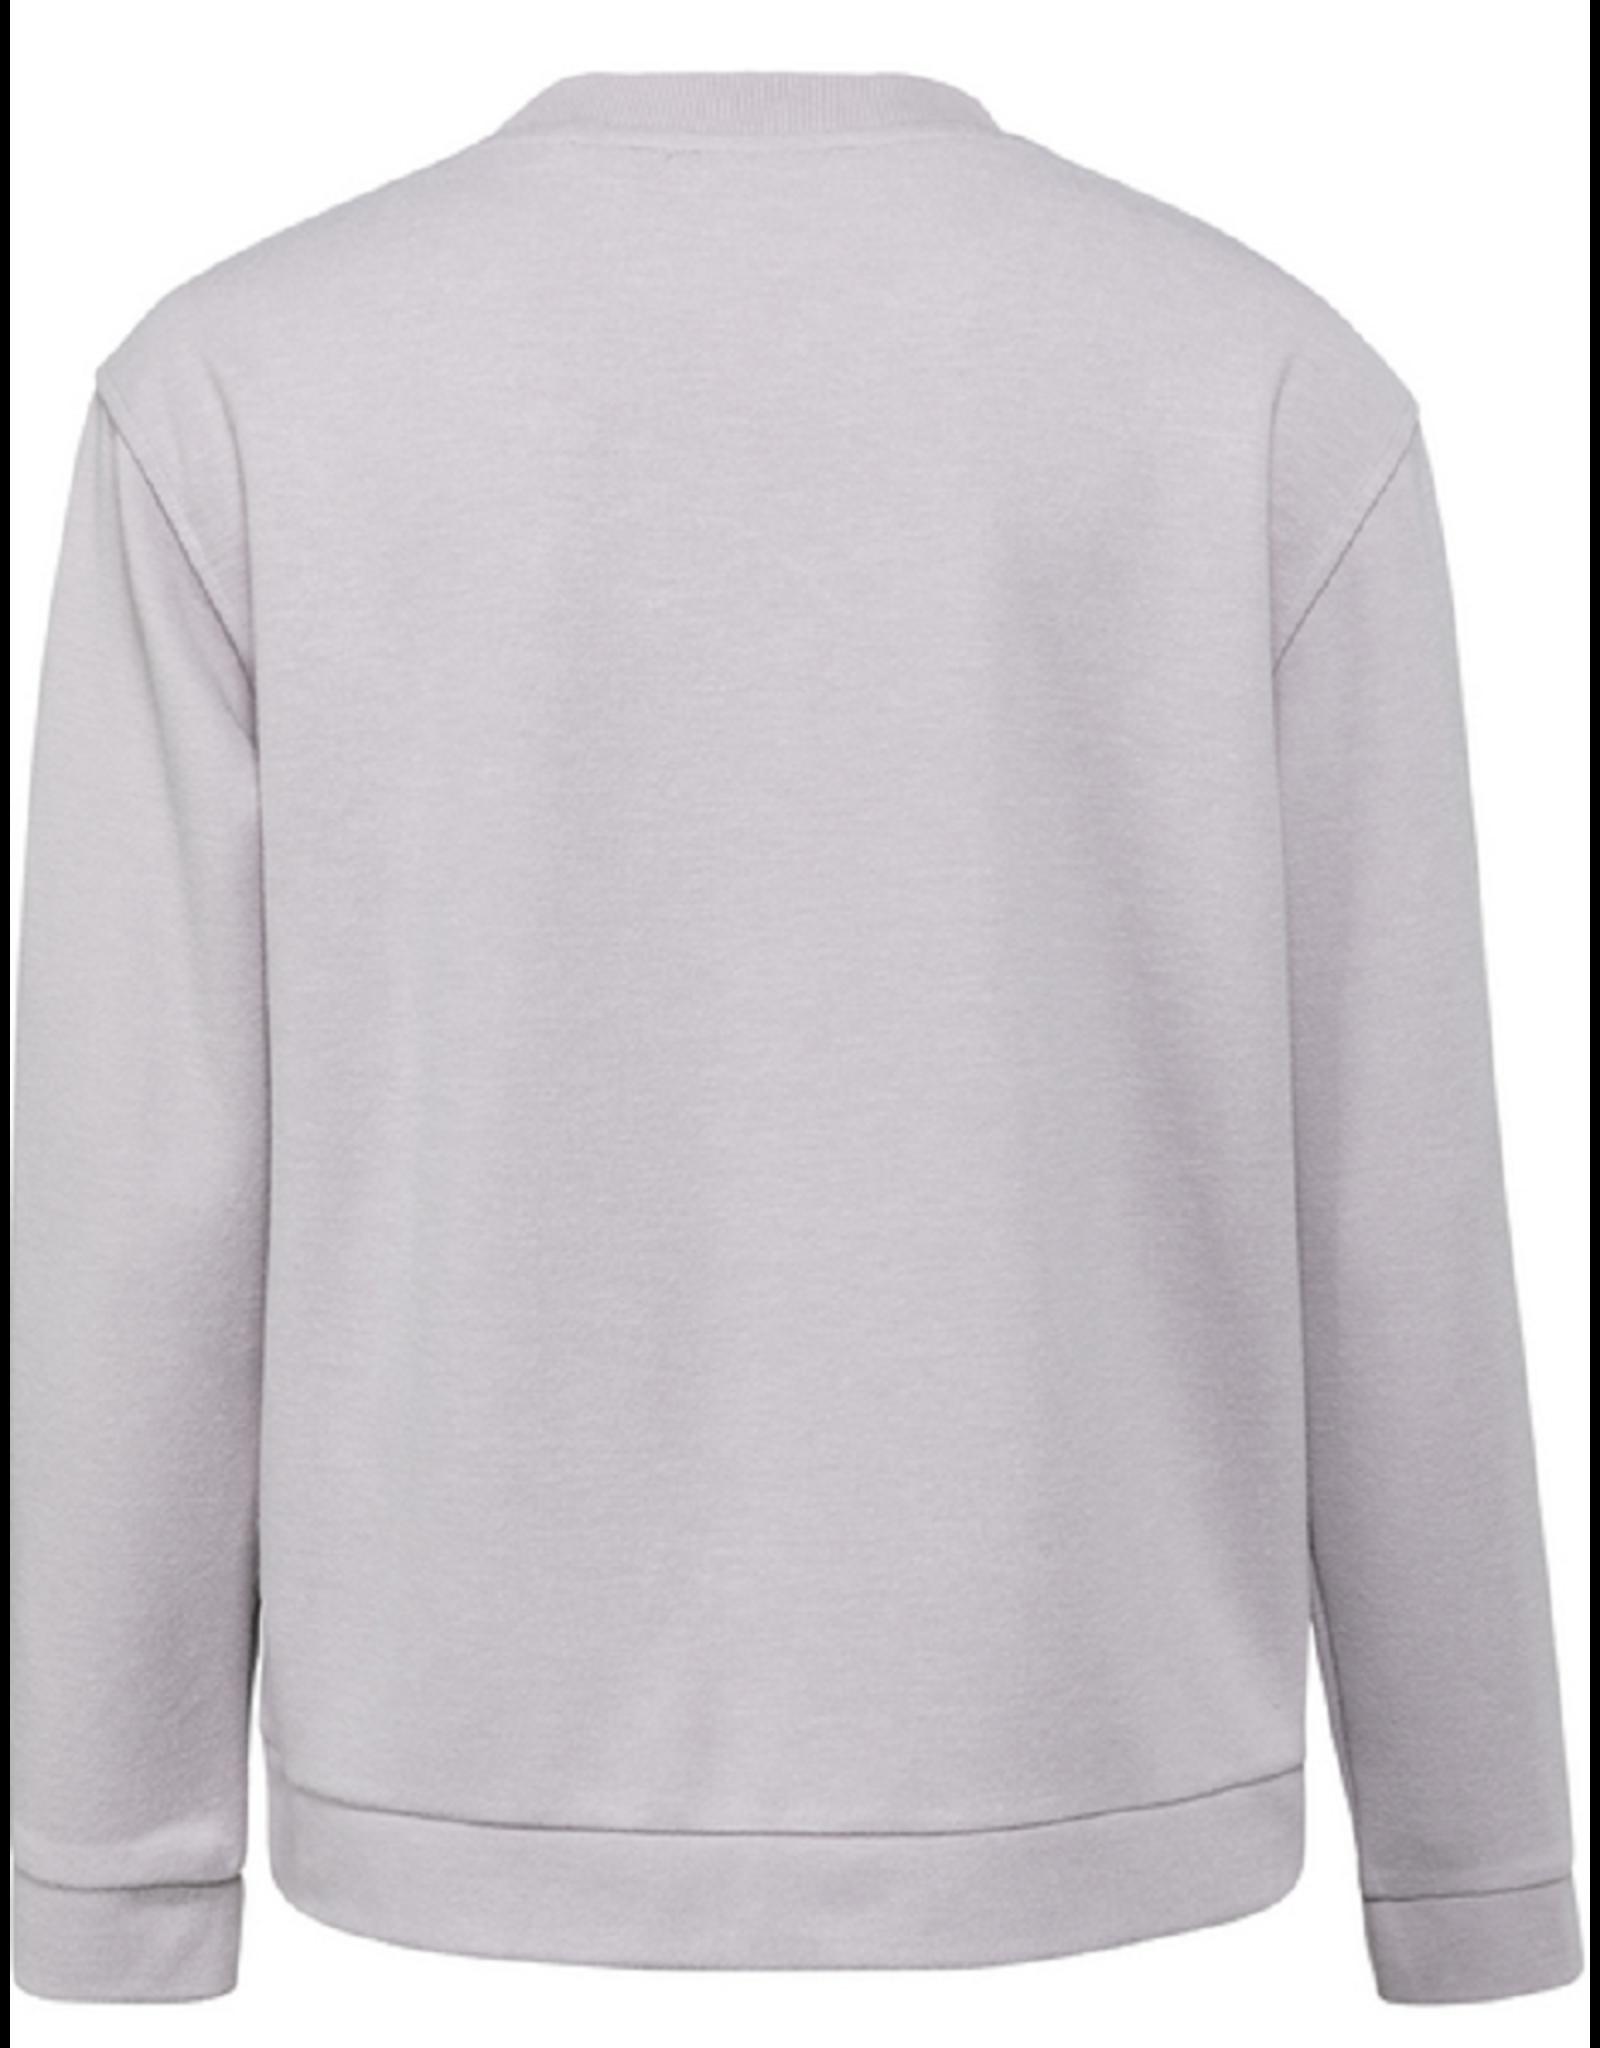 YAYA YAYA Soft sweater grey lila melange